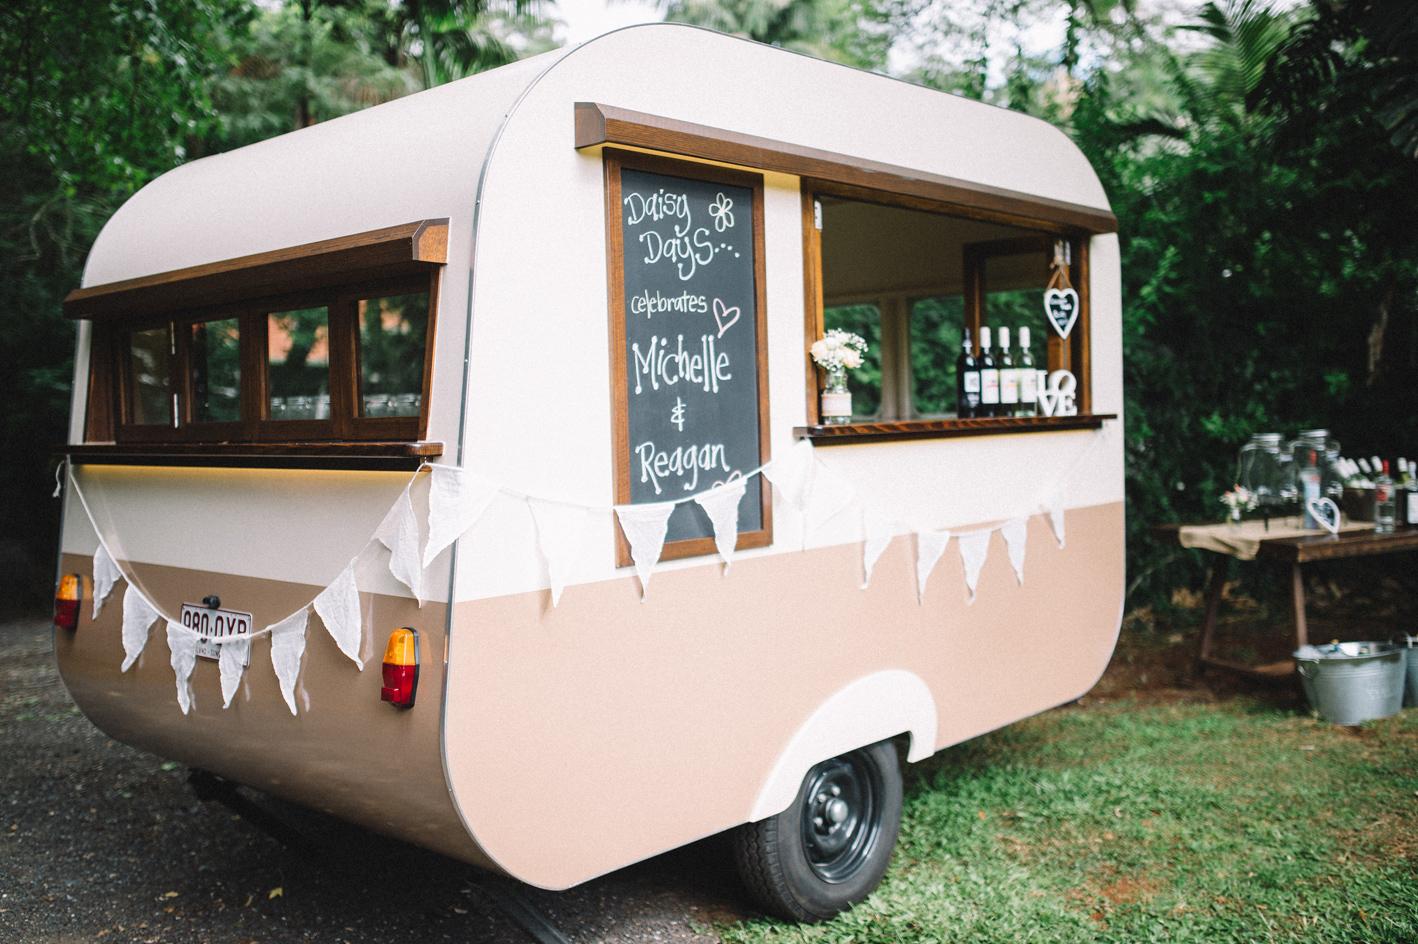 071-michelle-reagan-mount-tamborine-wedding-sophie-baker-photography